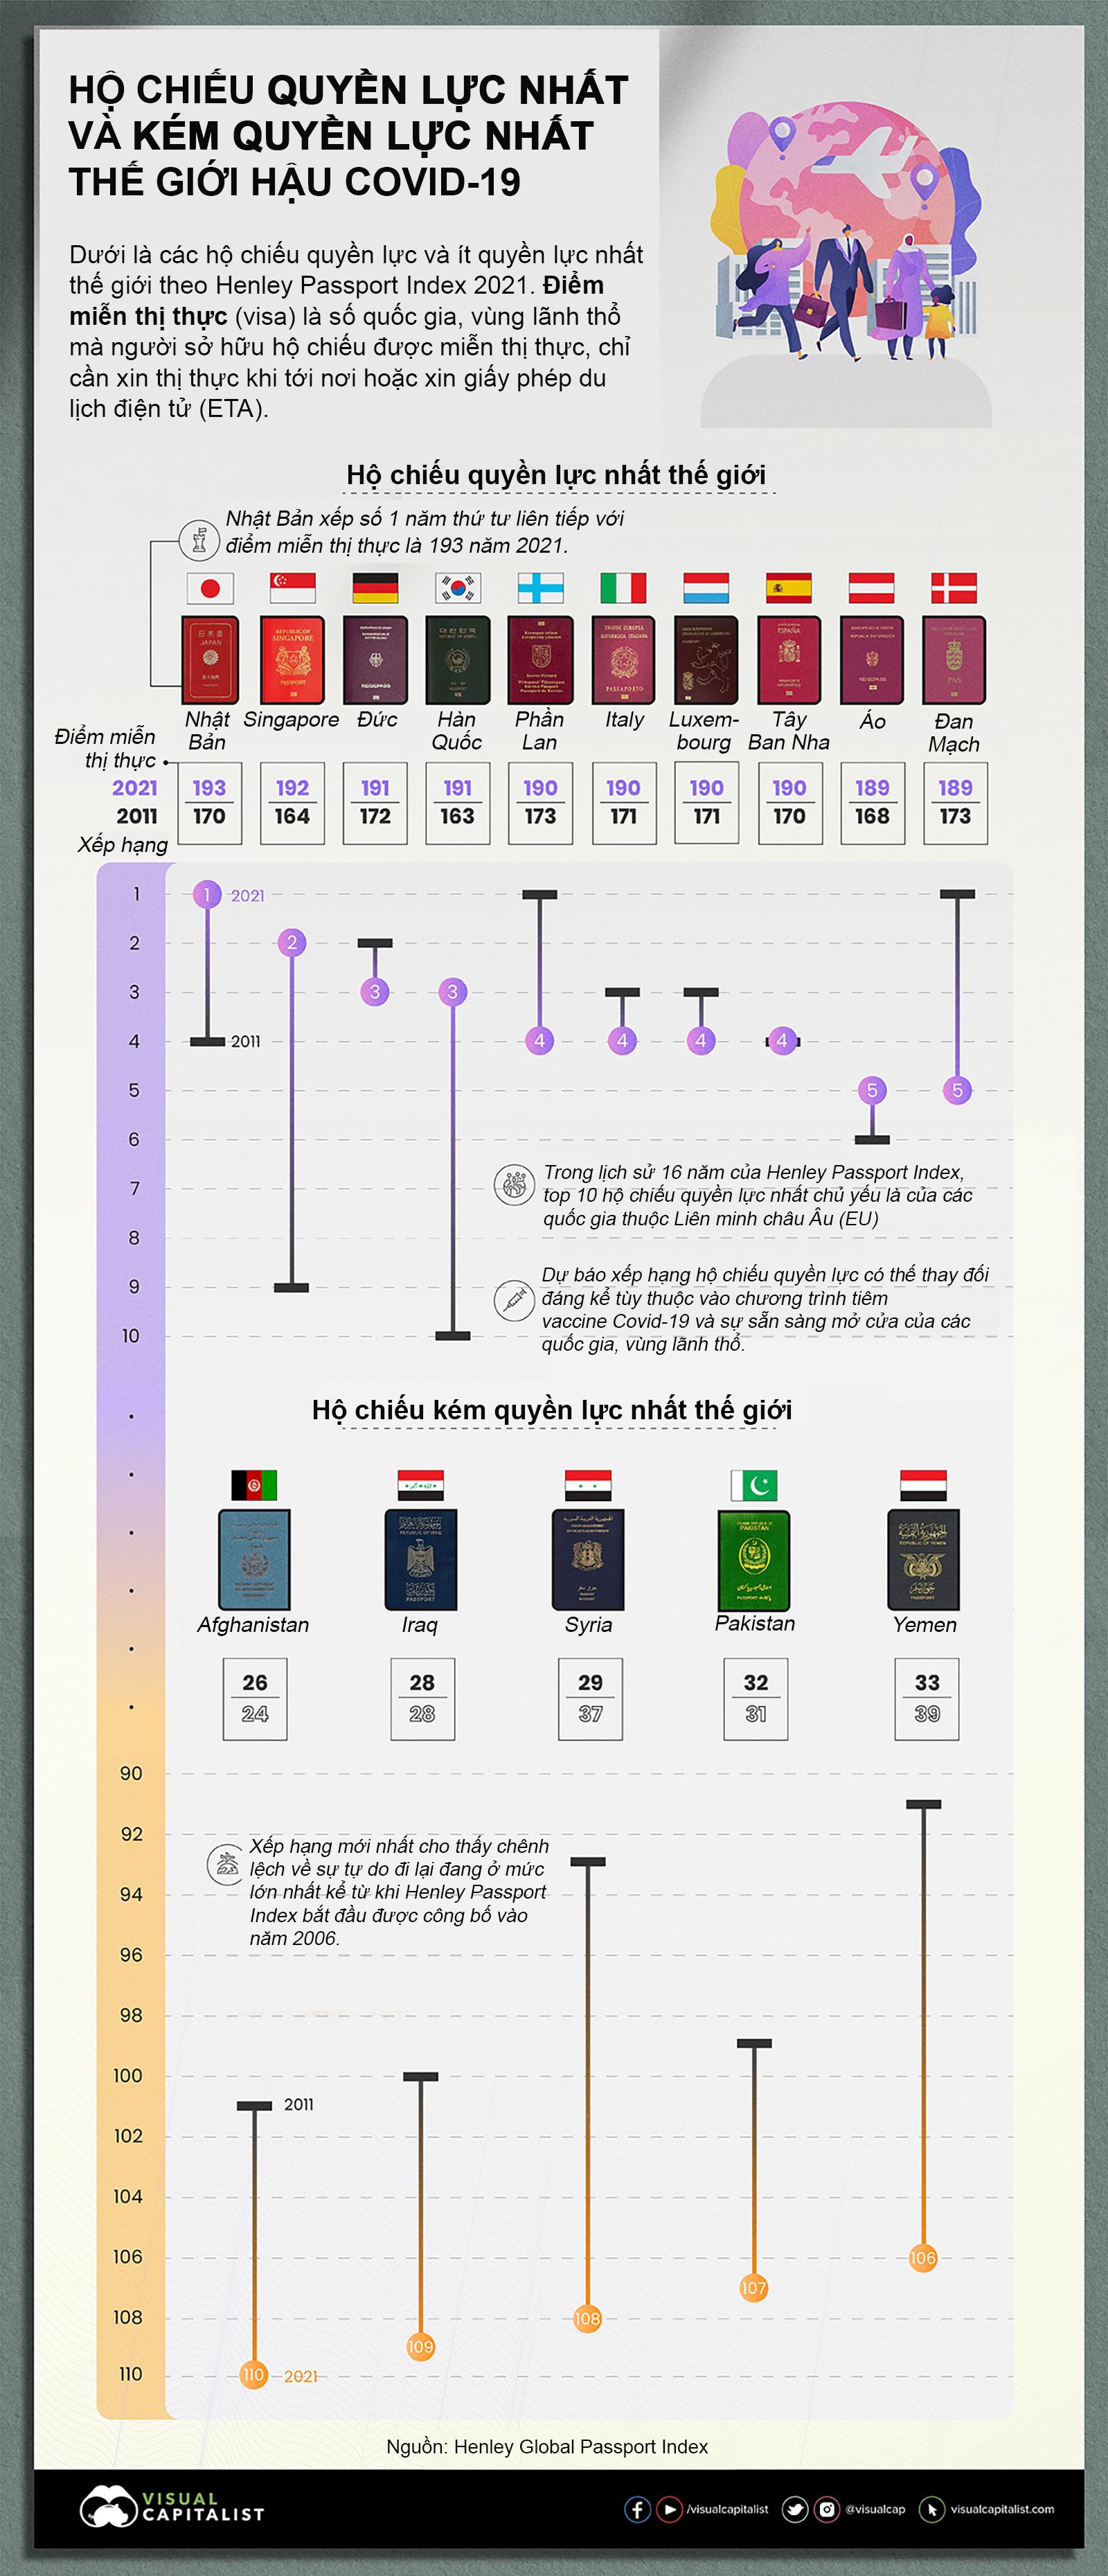 Nguồn: Visual Capitalist/Henley Global Passport Index